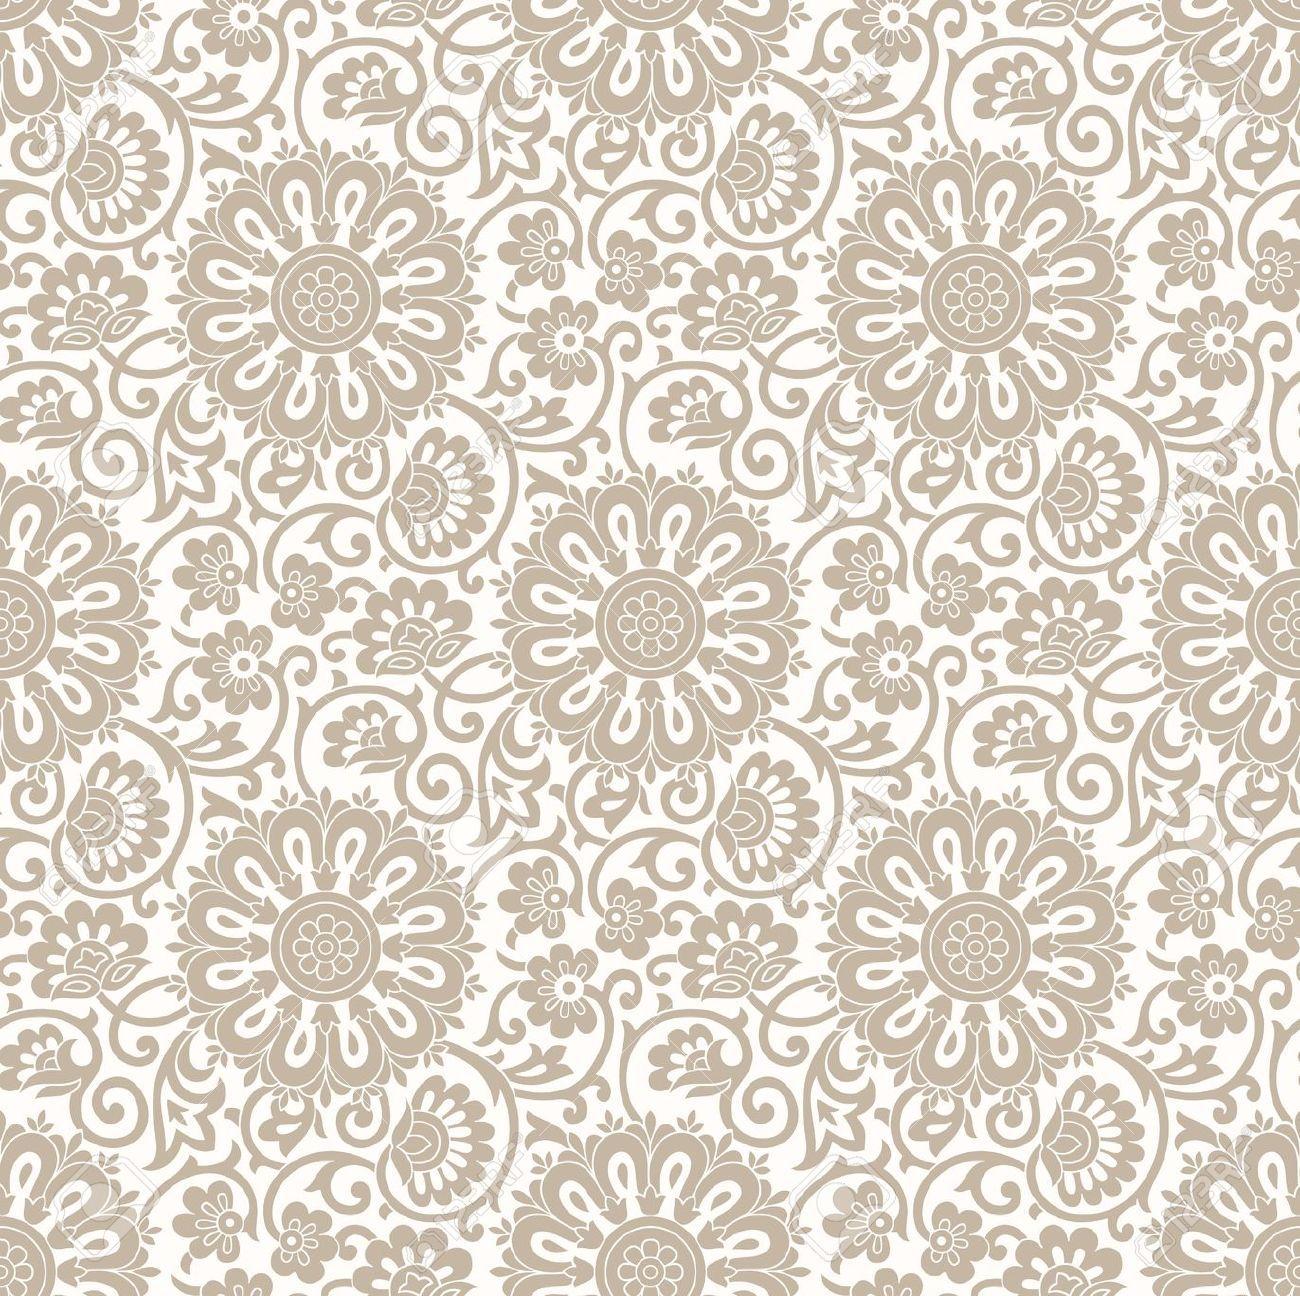 Seamless Wallpapers   Top Seamless Backgrounds   WallpaperAccess 1300x1296